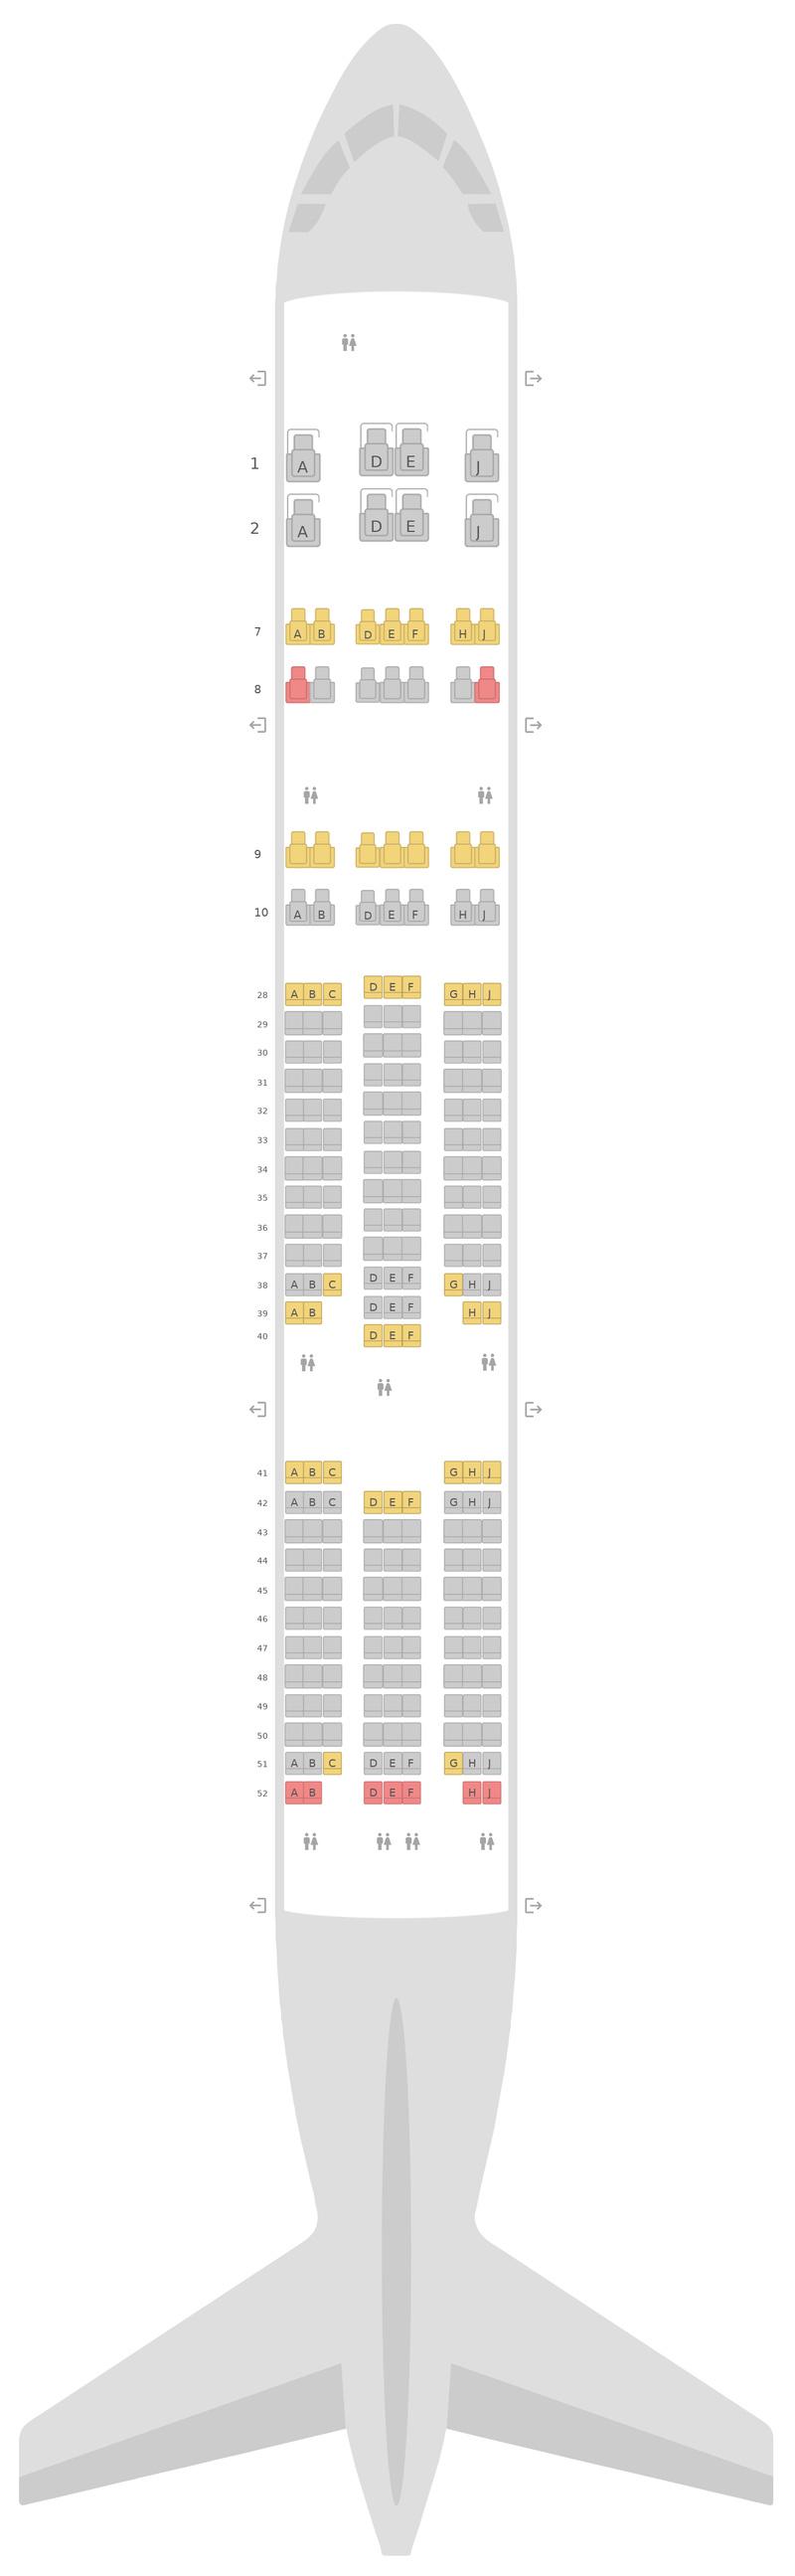 Seat Map Korean Air Boeing 777-200ER v1